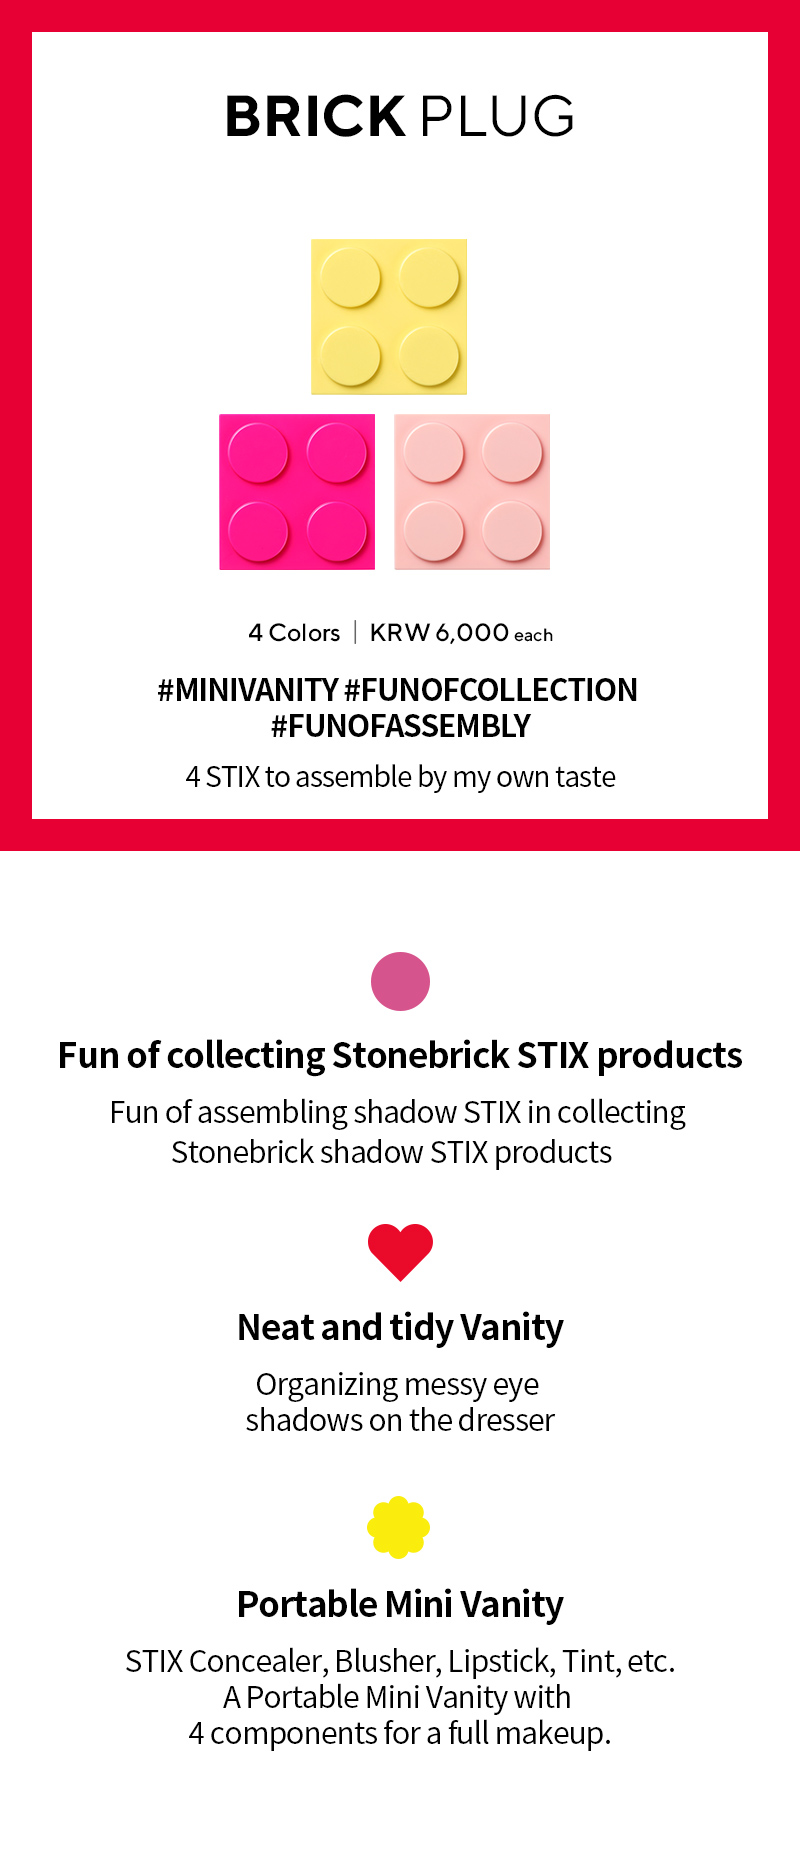 stonebrick-BRICK-PLUG-4-Colors-Product-Description-01